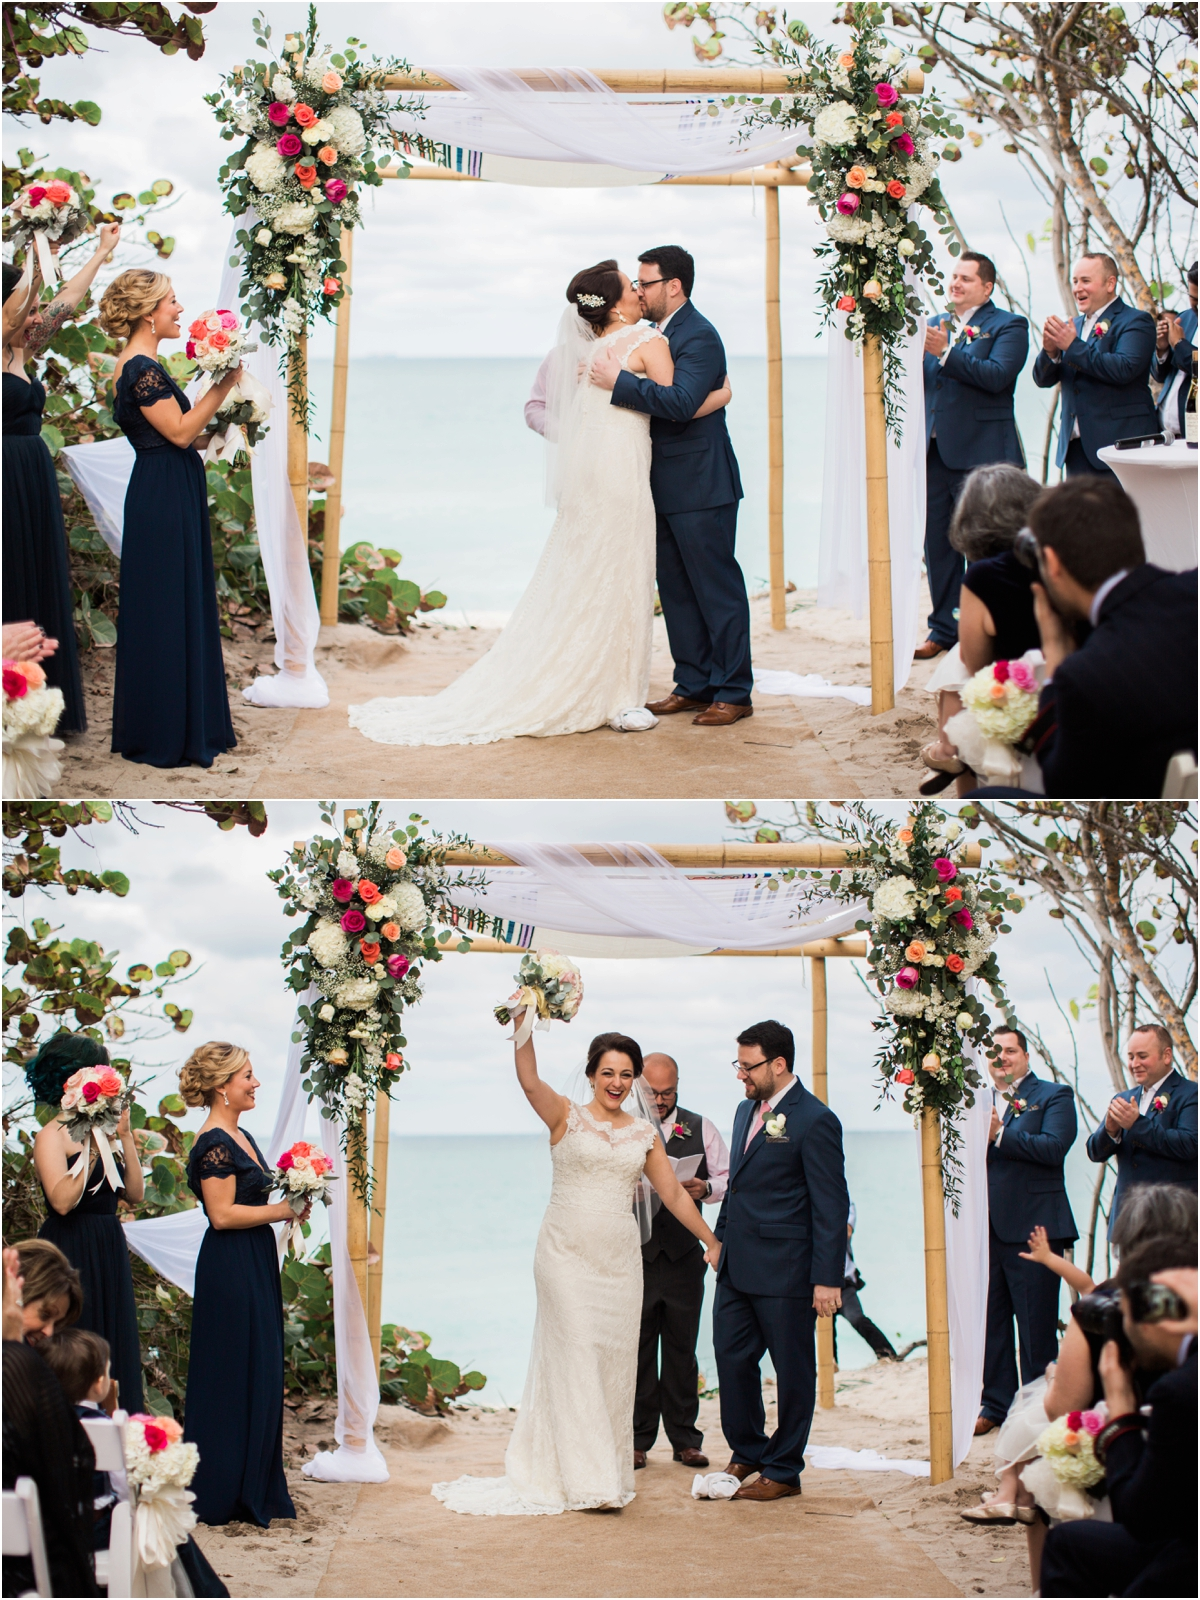 Jupiter-Beach-Resort-Wedding-Venue-photos_0020